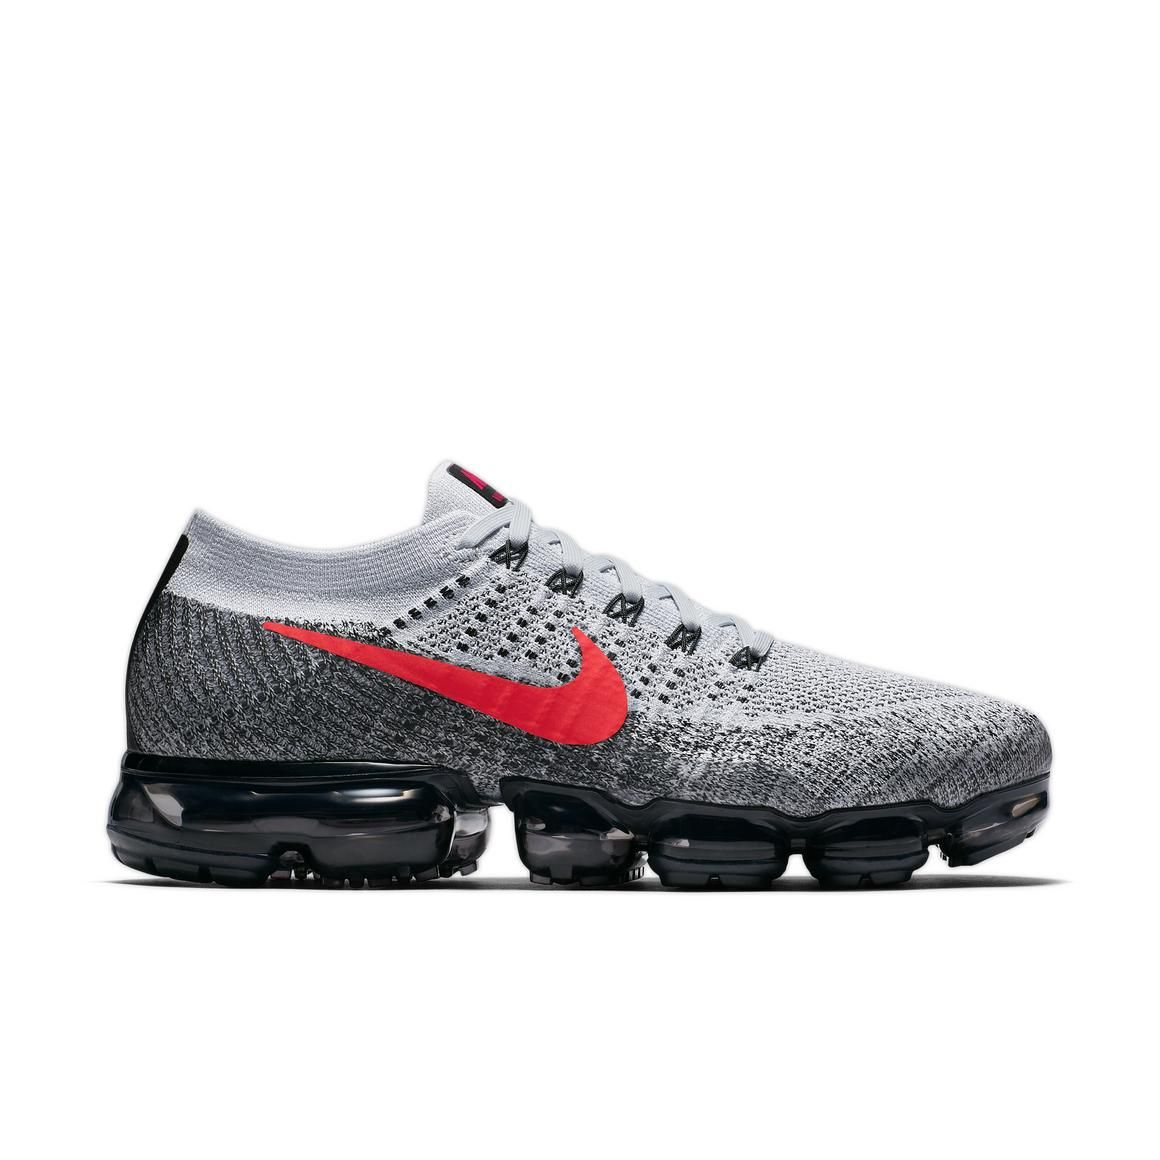 390469c8fdea Nike Air VaporMax Flyknit